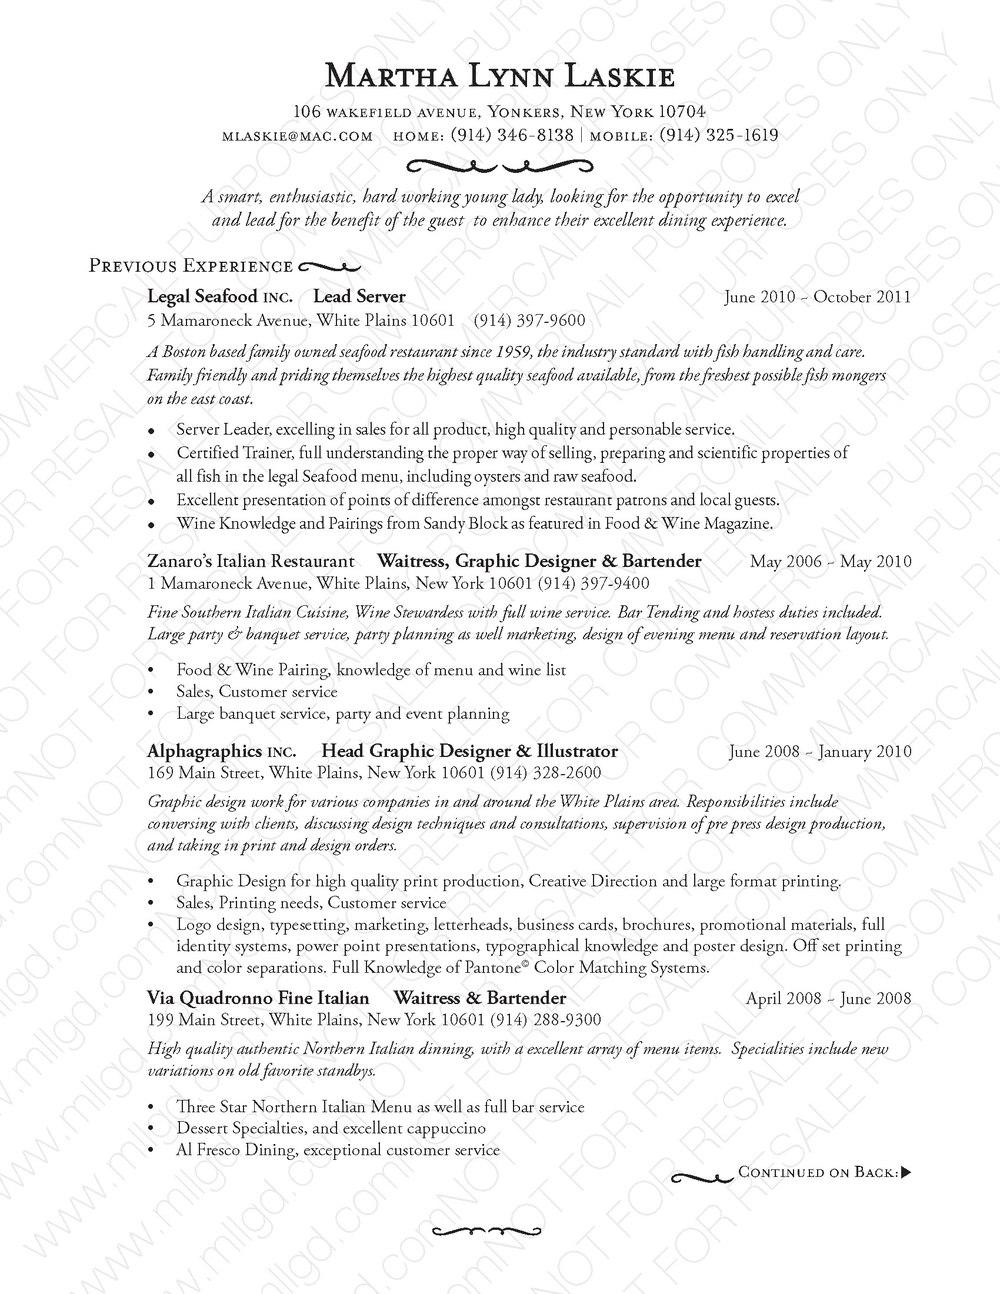 MLL_Resume_Design_2014_Page_55.jpg